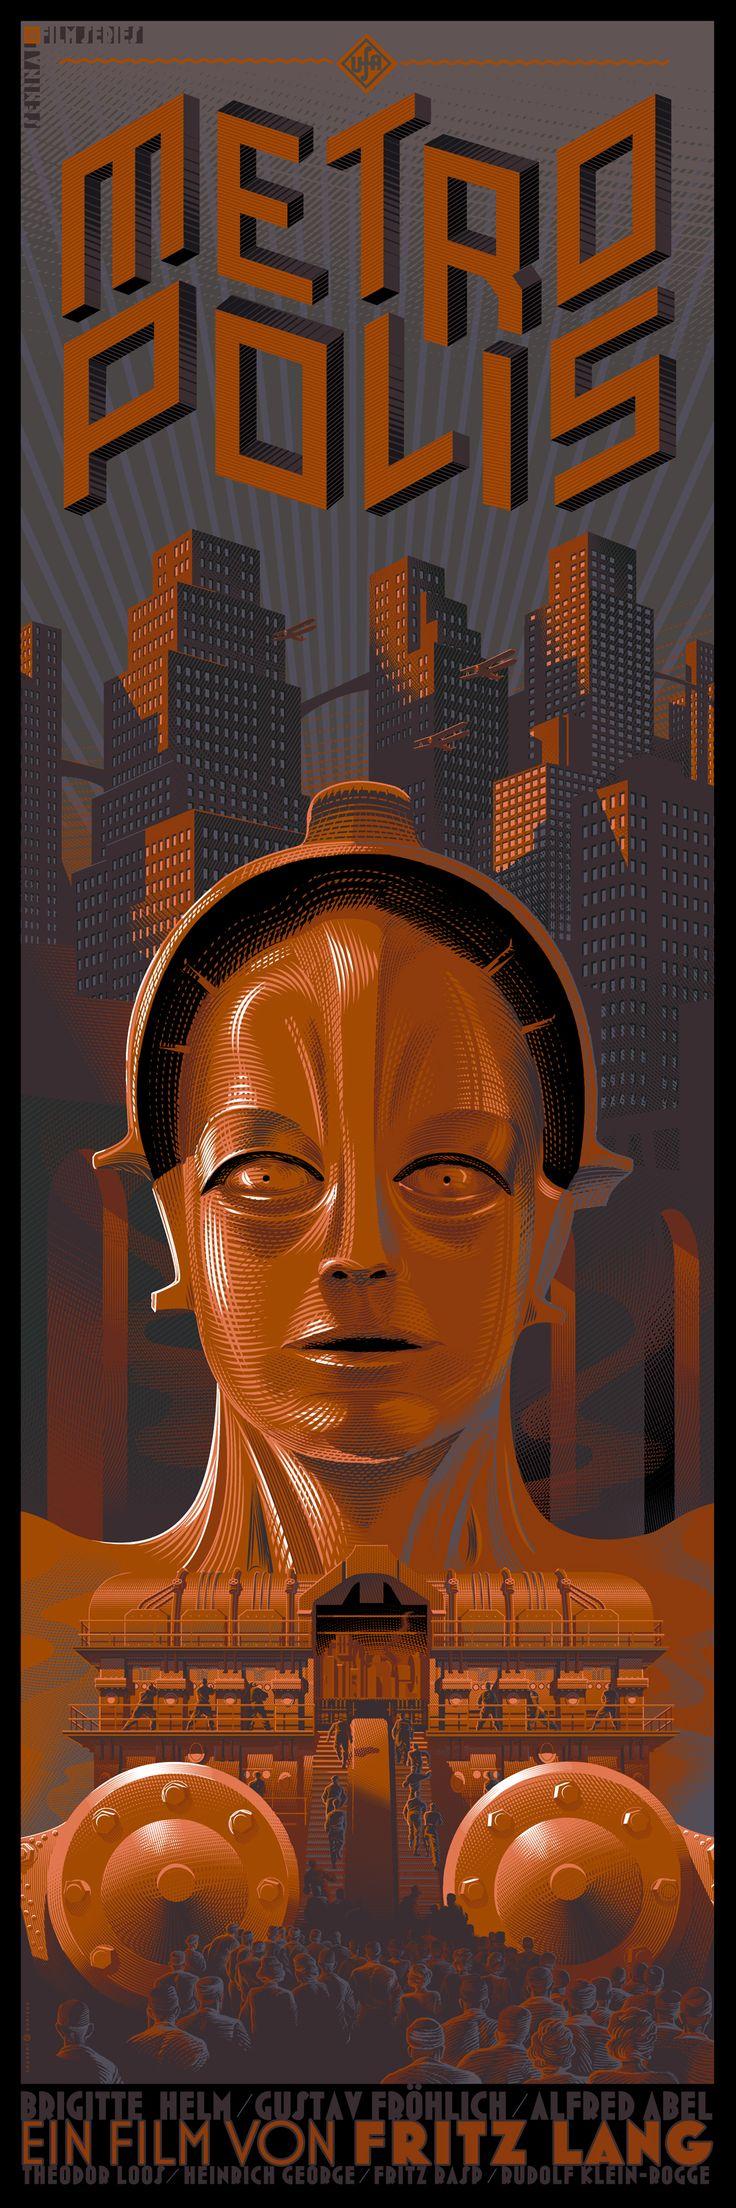 Metropolis-Alternate_Edition.jpg (1000×3000)